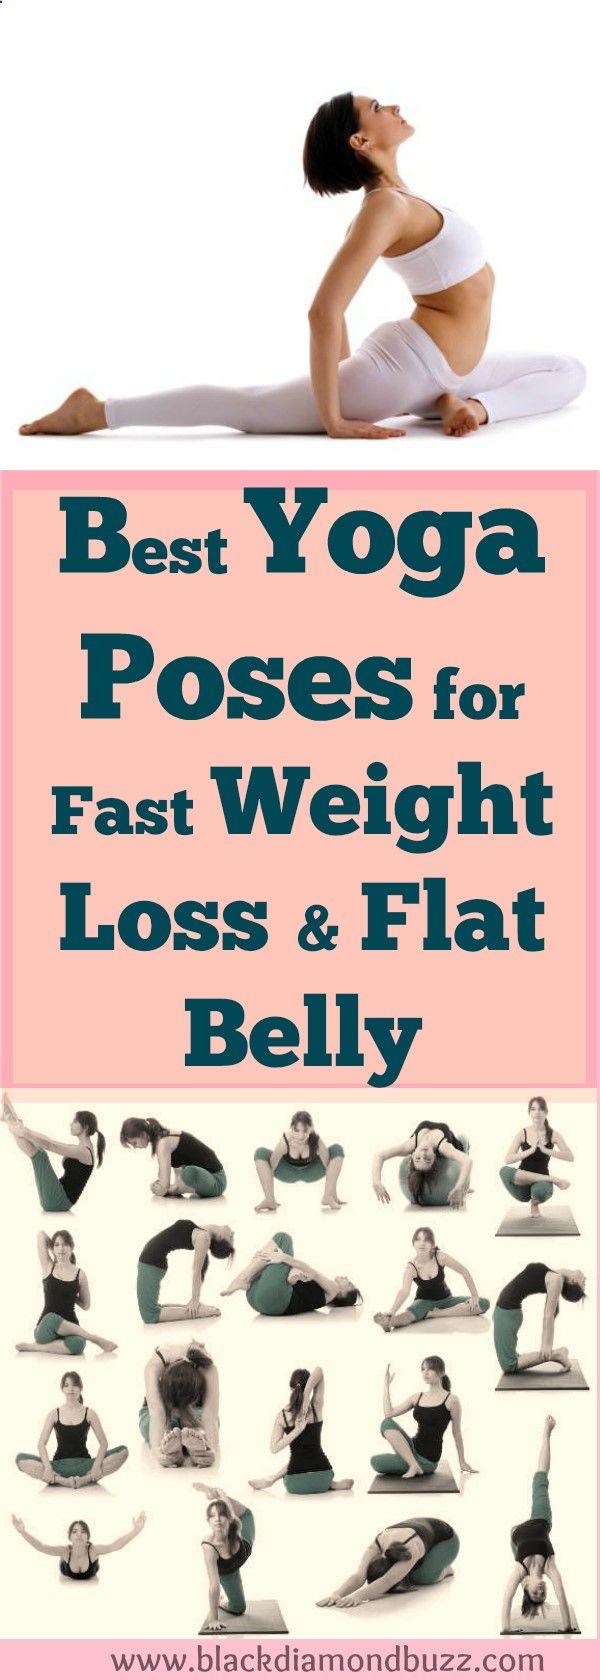 45 days weight loss program